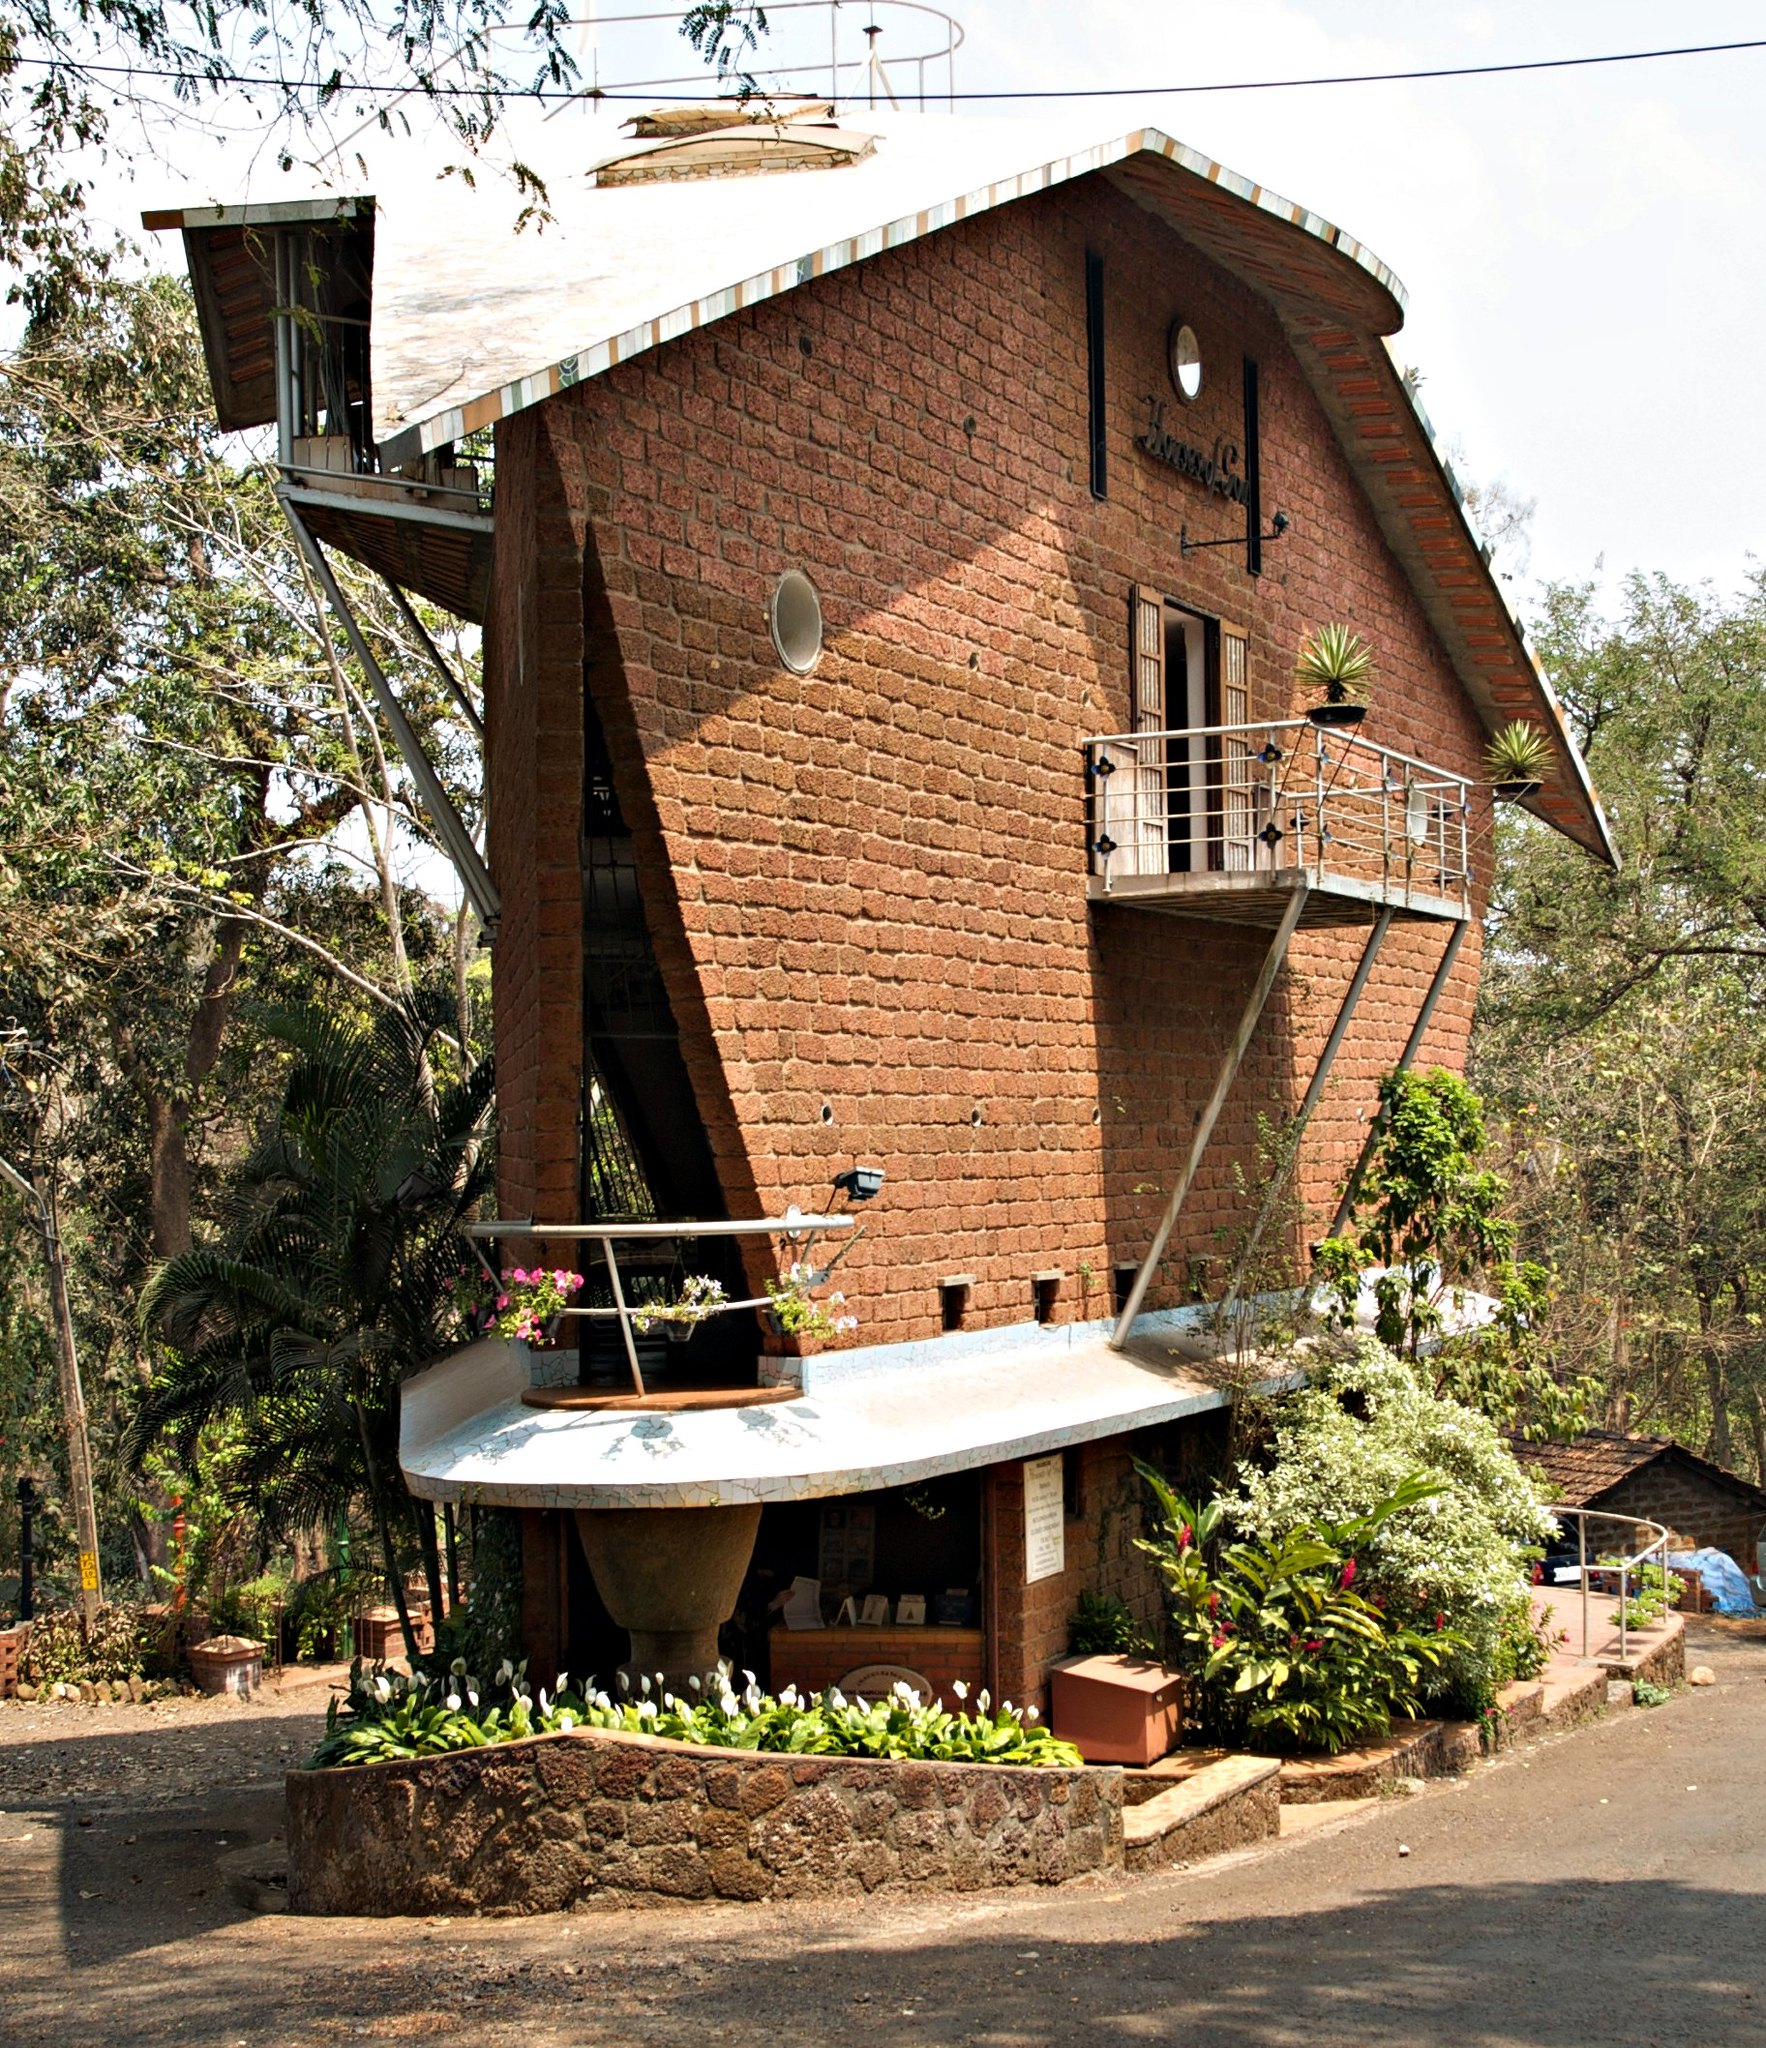 Best Goa Museum-Houses of Goa